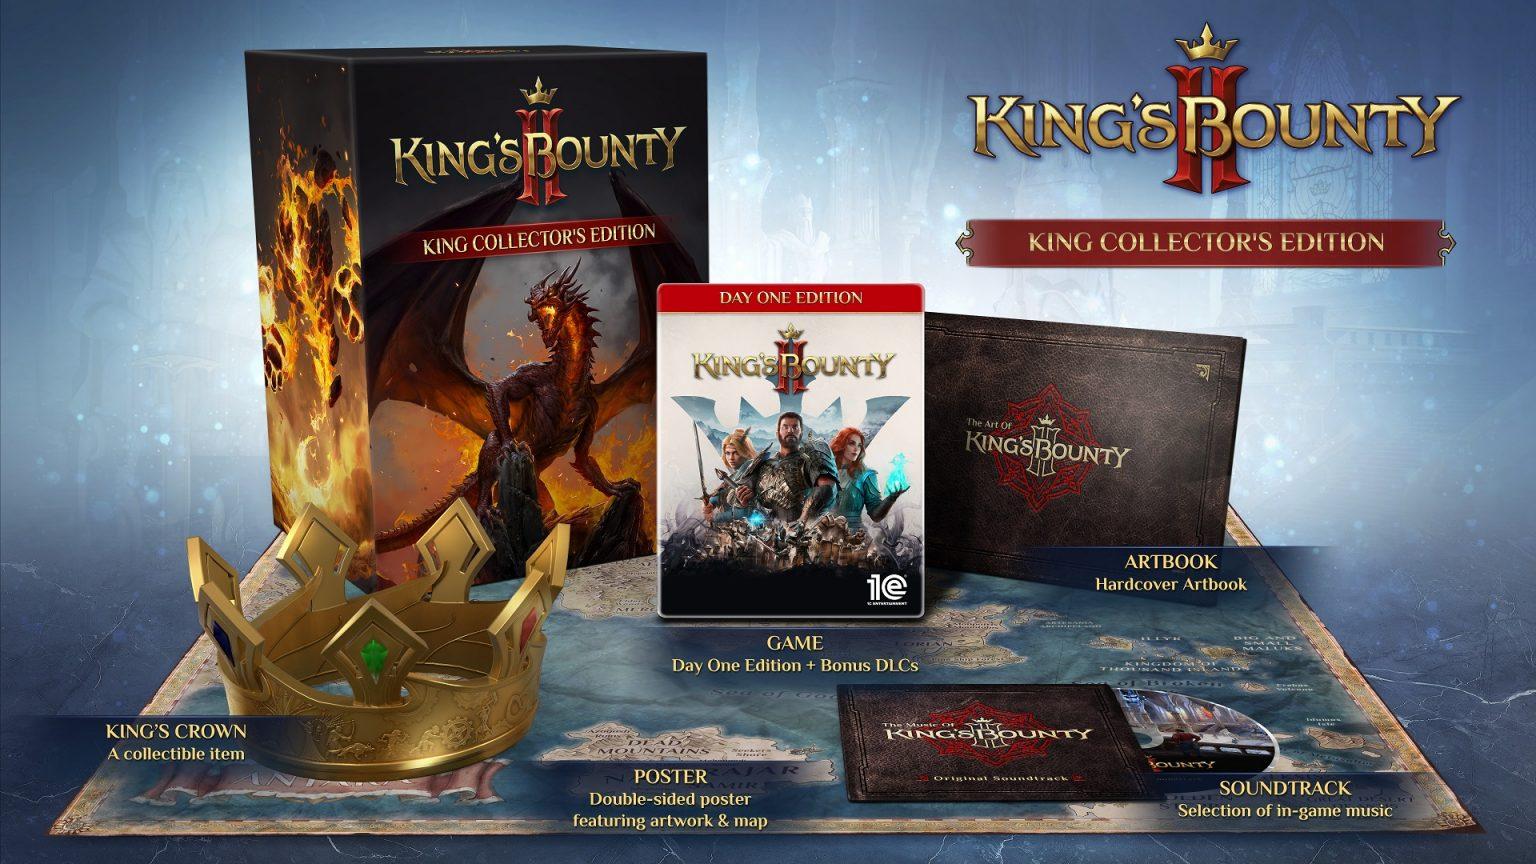 095556-kings-bounty-ii-06-04-21-2-1536x8